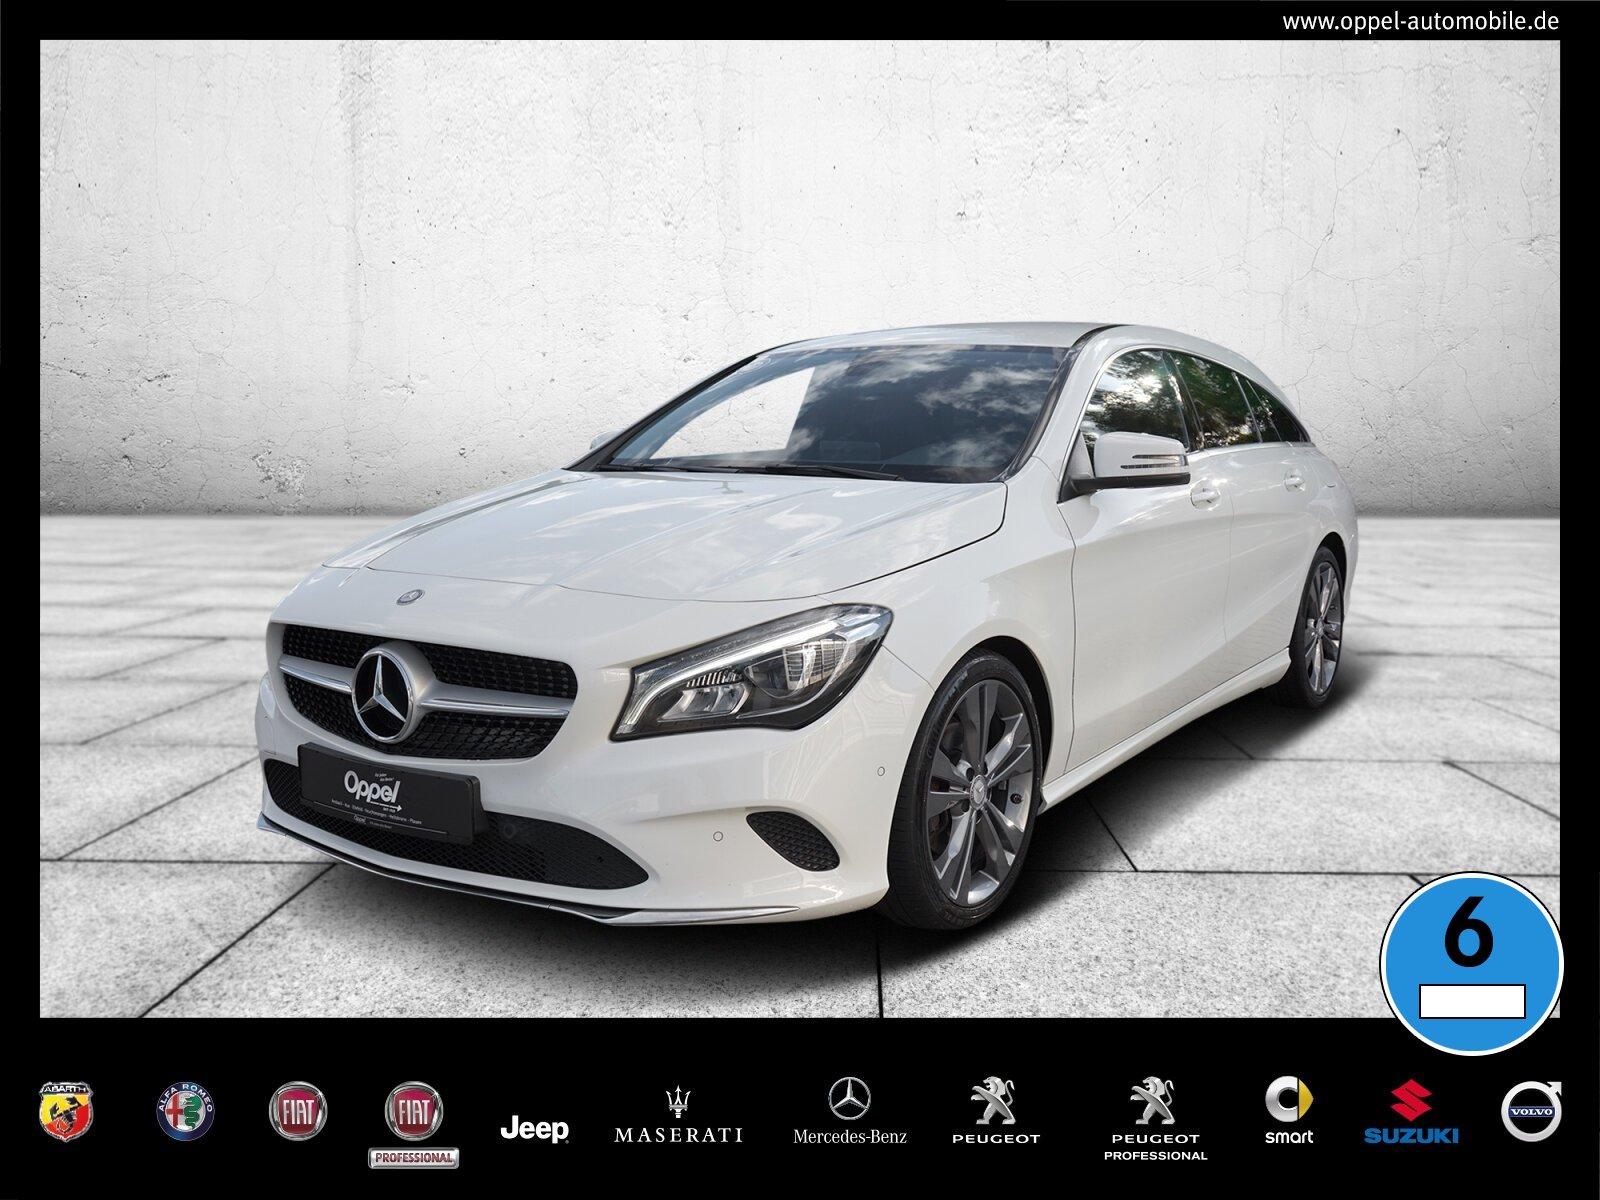 Mercedes-Benz CLA 200 d SB URBAN+NAVI+KAMERA+LED+PTS+SITZHEIZ., Jahr 2017, Diesel